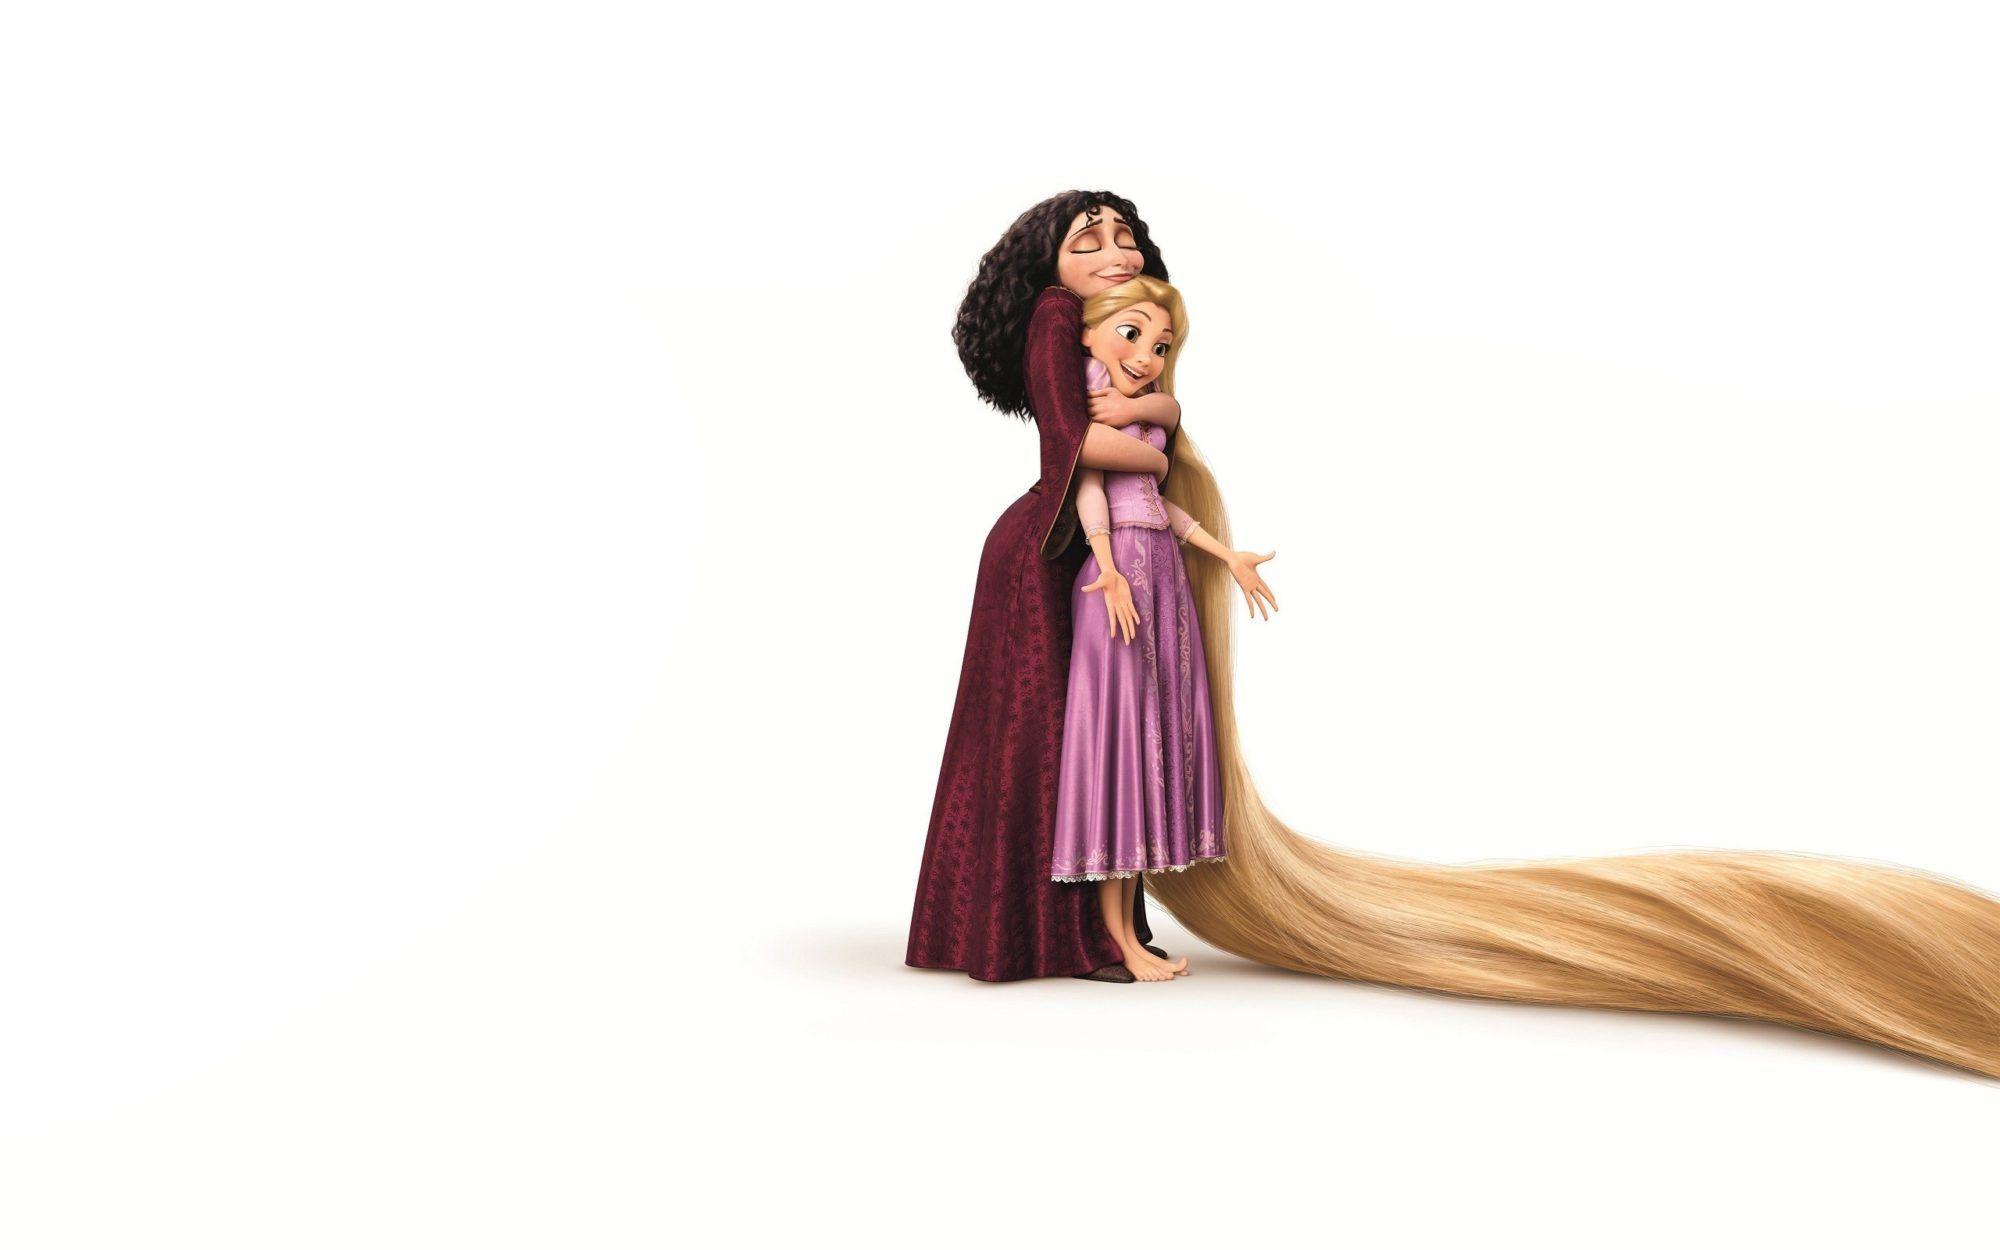 Rapunzel: una maschile e un femminile disequilibrati | Dipendiamo.blog